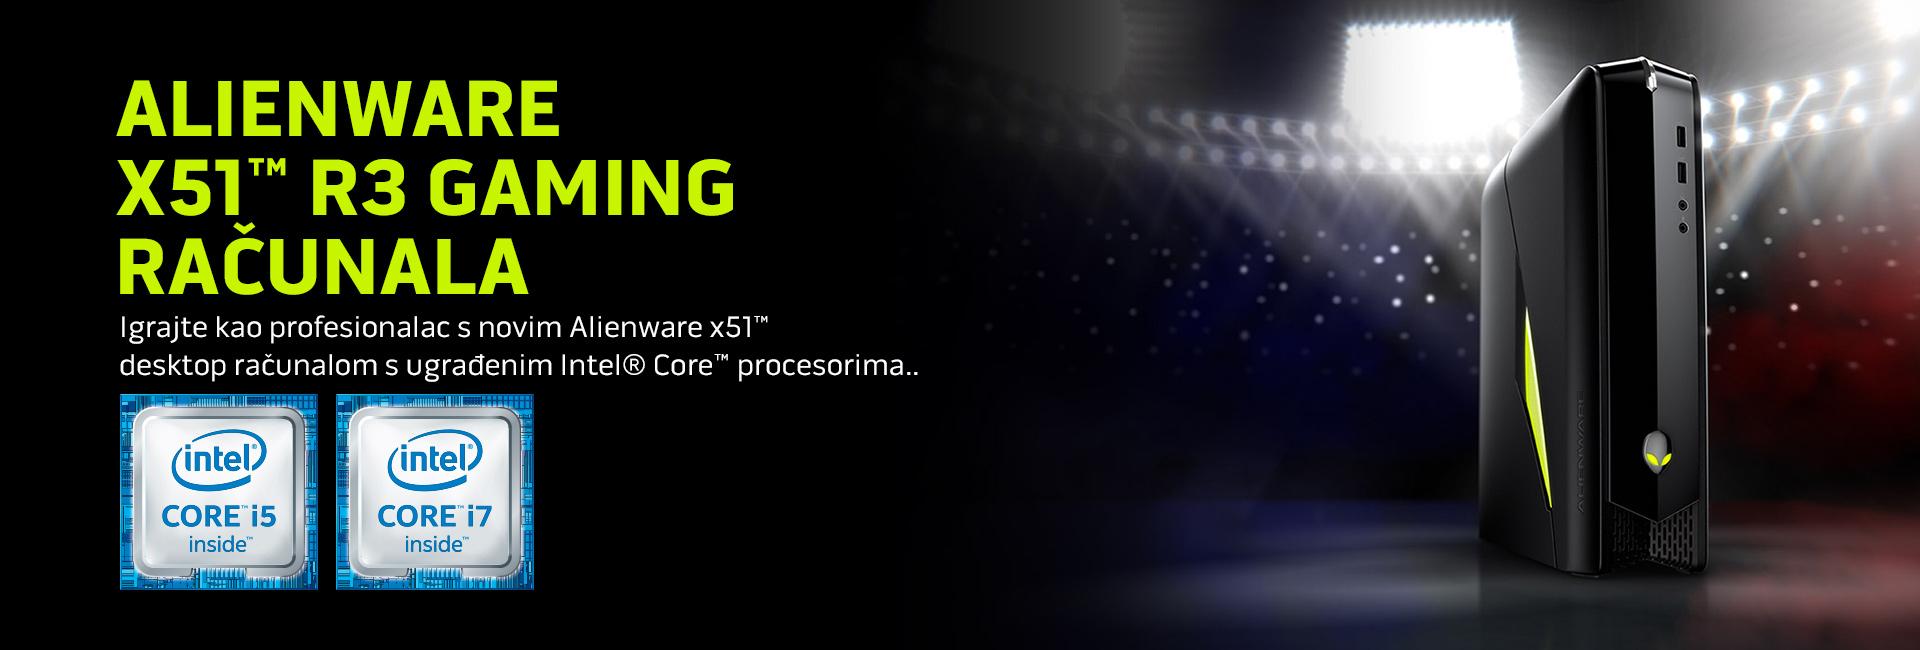 Alienware X51™ R3 gaming računala